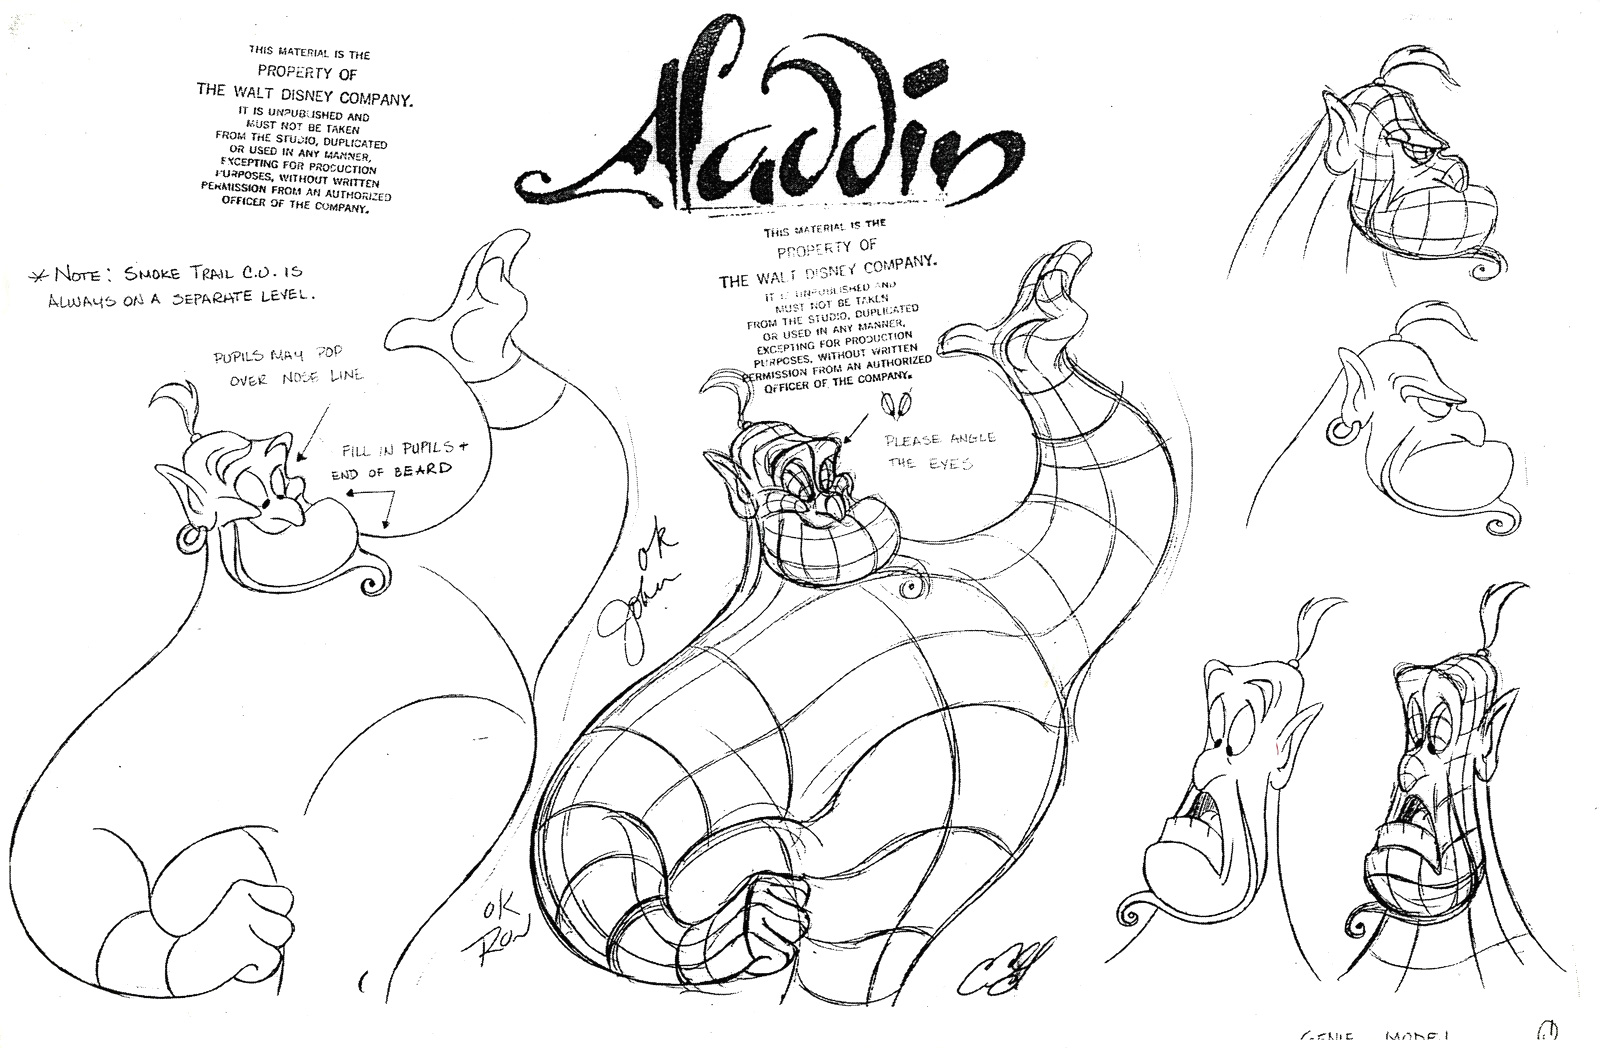 aladdin_disney_production_drawing_01.jpg